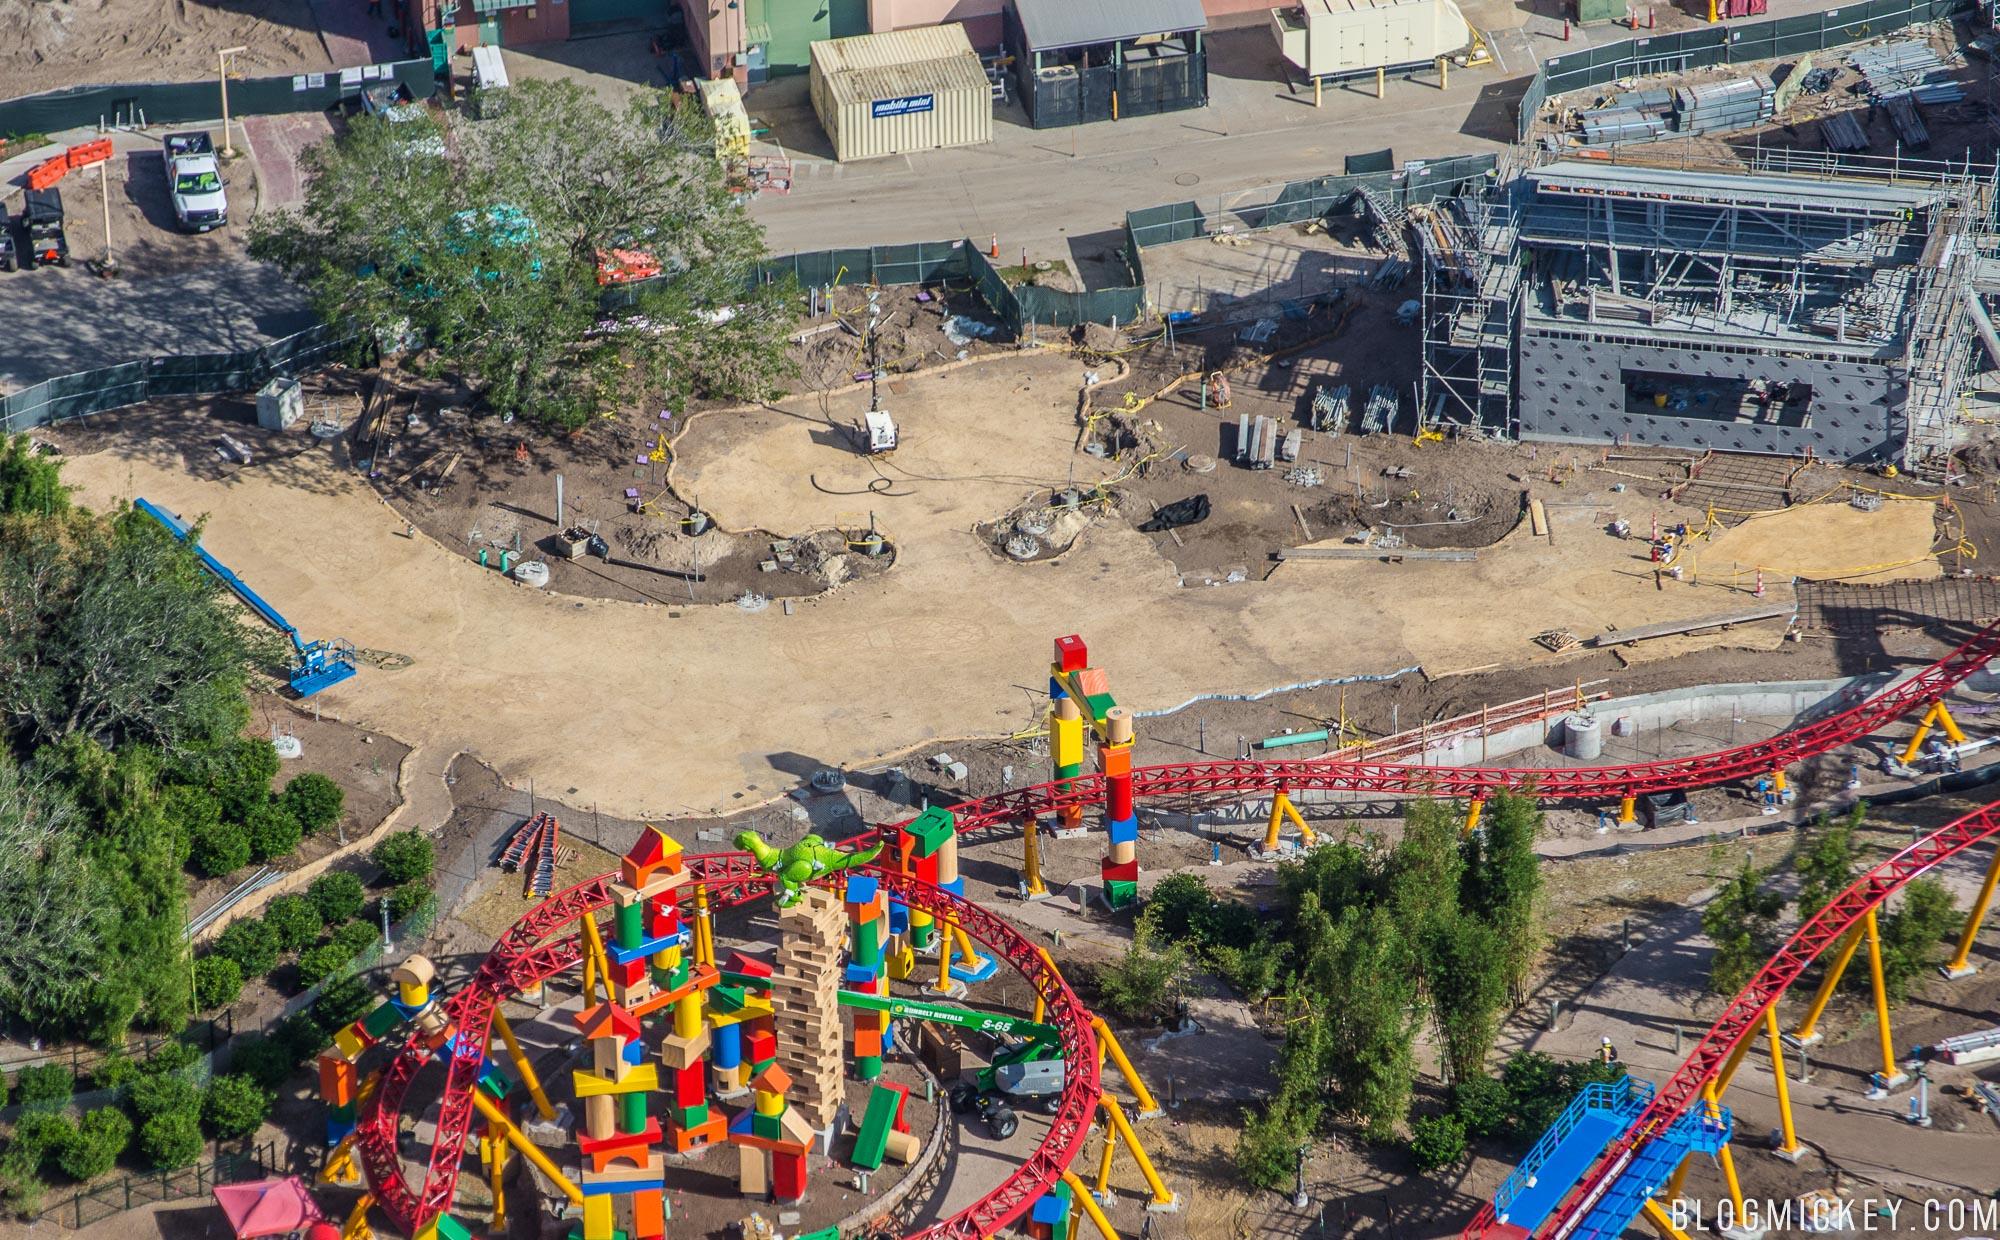 toy-story-land-air-11062017-2.jpg